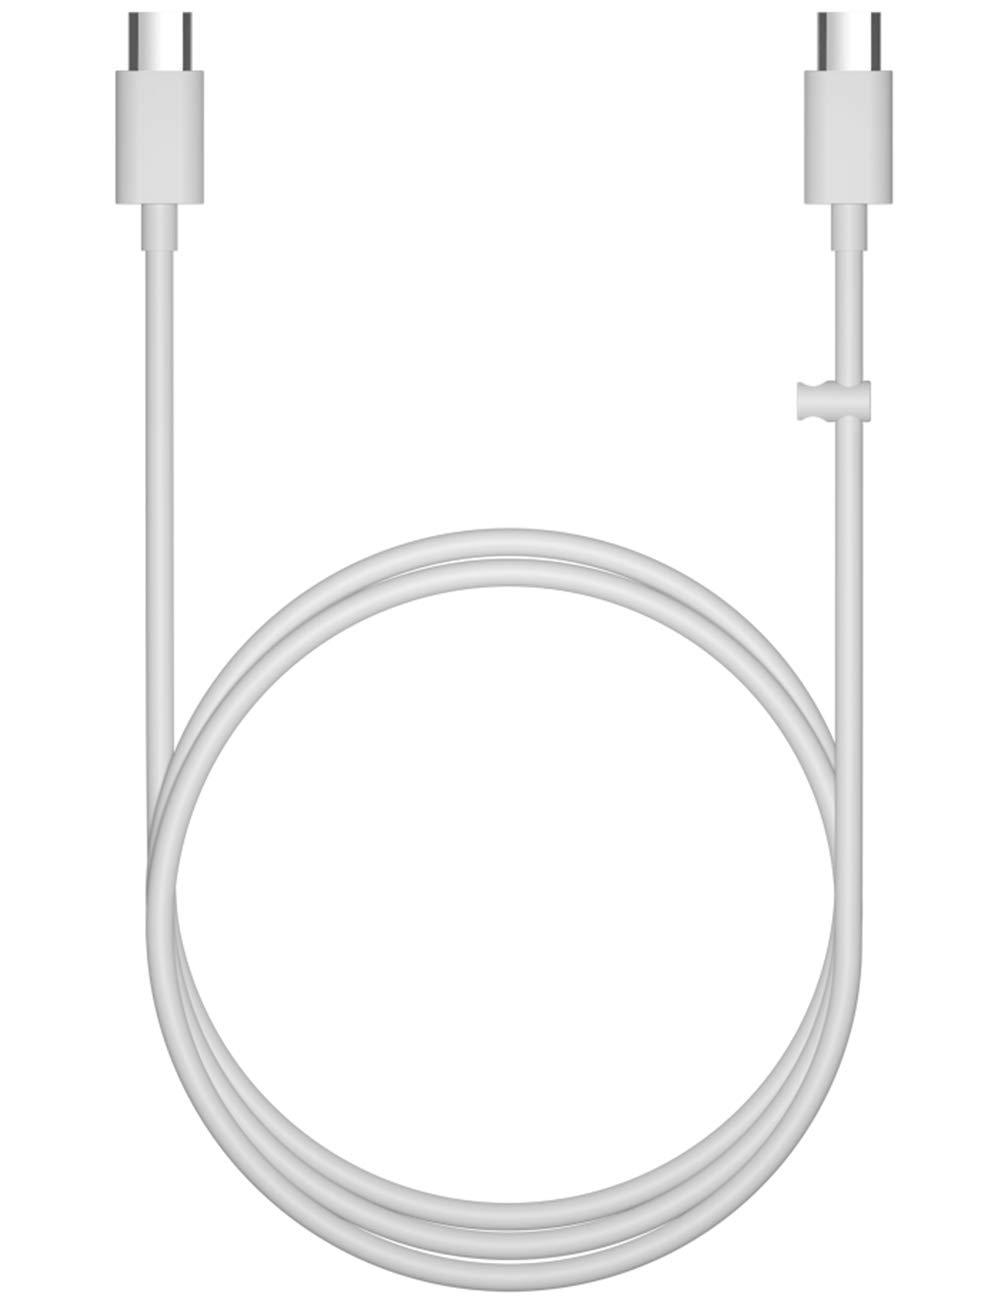 USB C to USB C Cable, iMangoo USB Type C Fast Charging Cable Data Transfer Cord 5V/3A 9V/2A Quick Charge Cable for Google Pixel 2, Pixel 2 XL, Pixel 3, Pixel 3 XL, Google Nexus 6P (3.3ft)